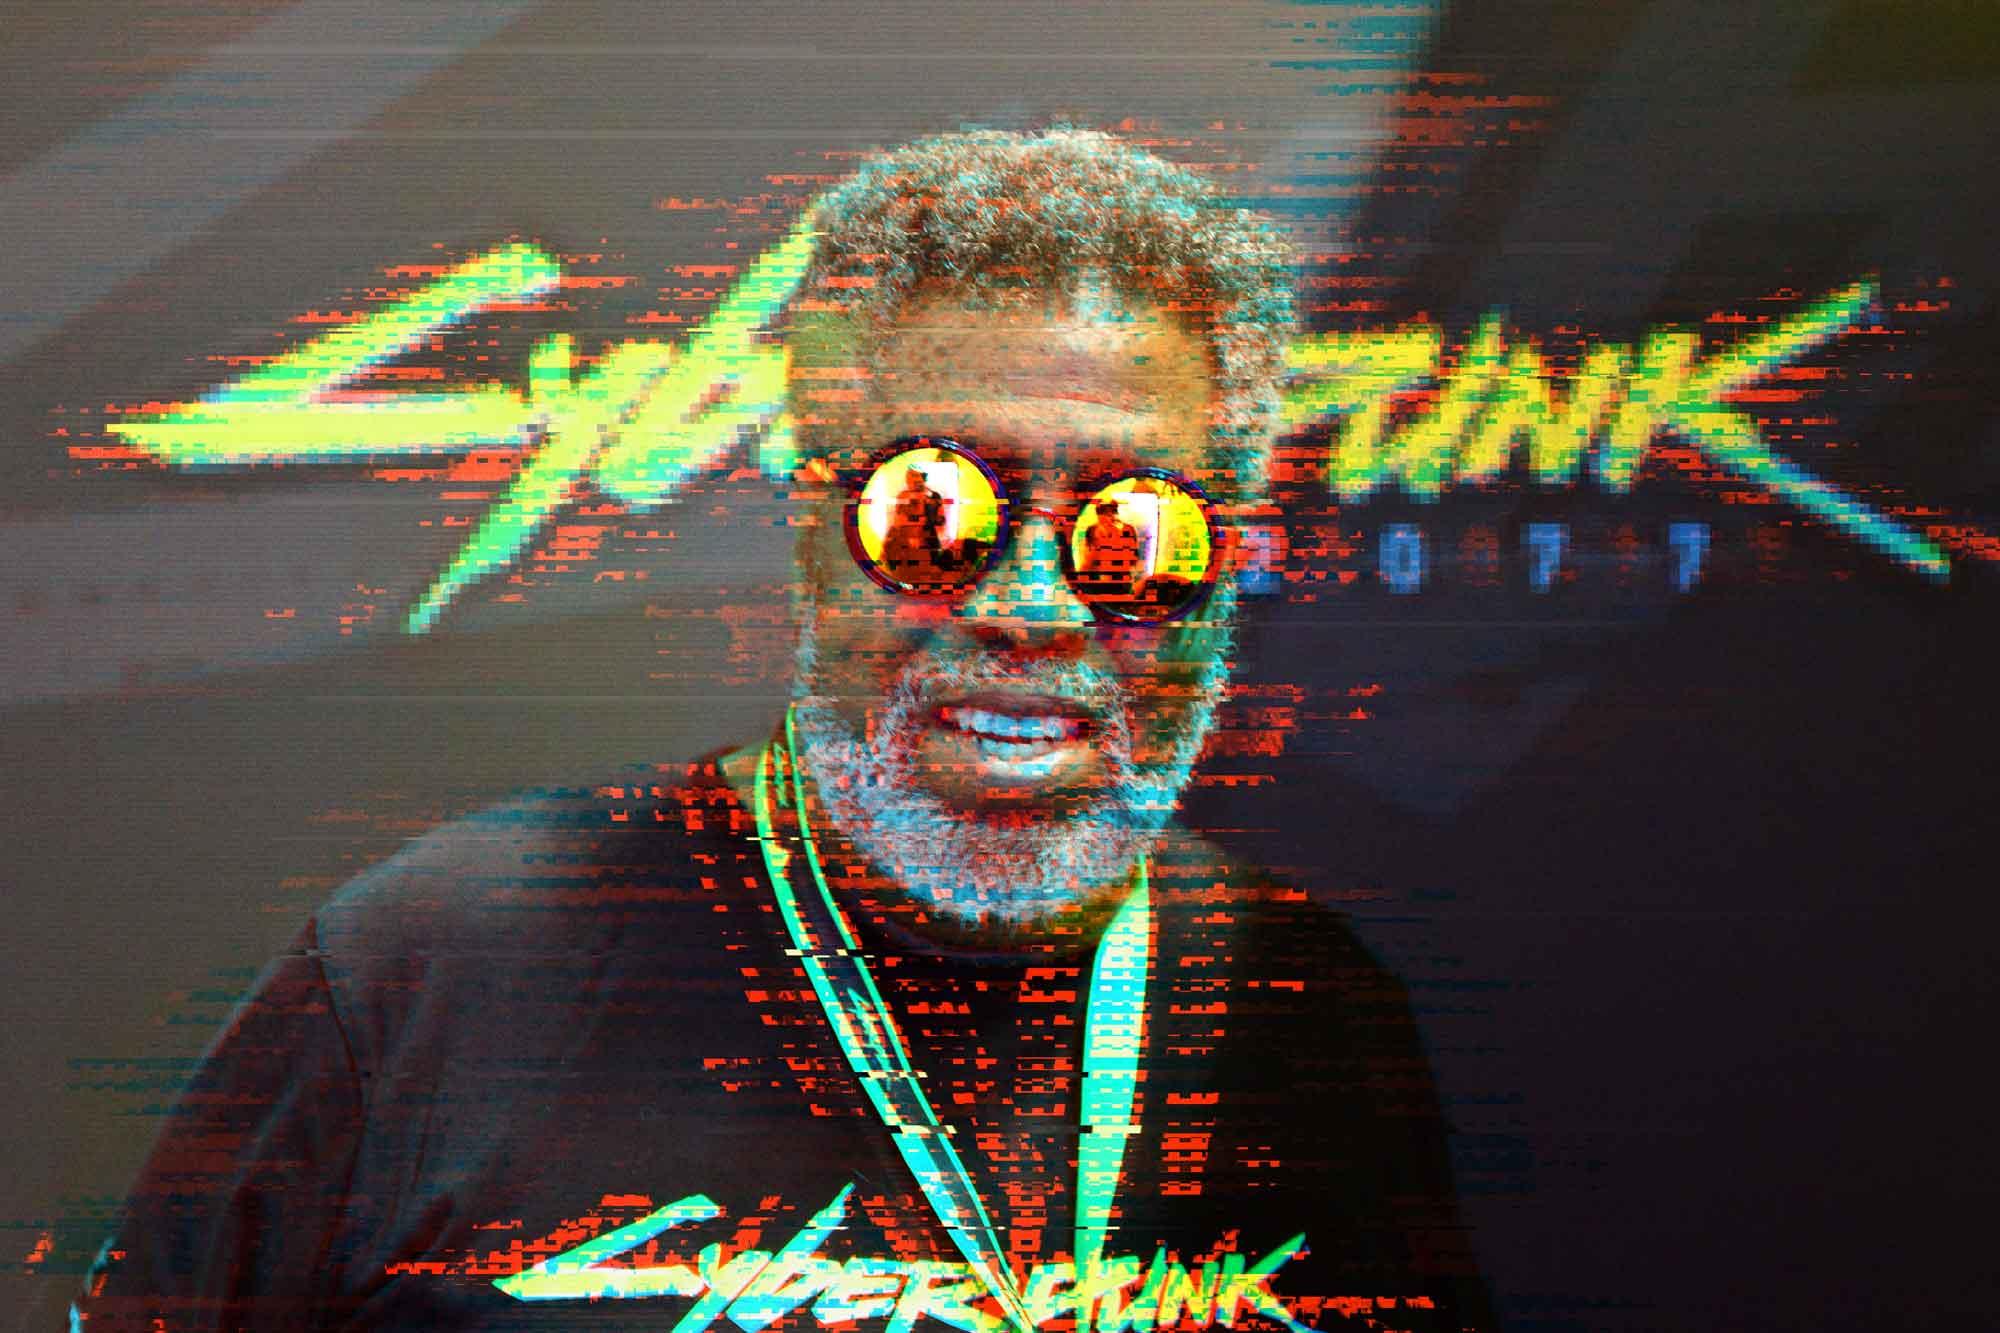 Cyberpunk 2077: Intervista a Mike Pondsmith